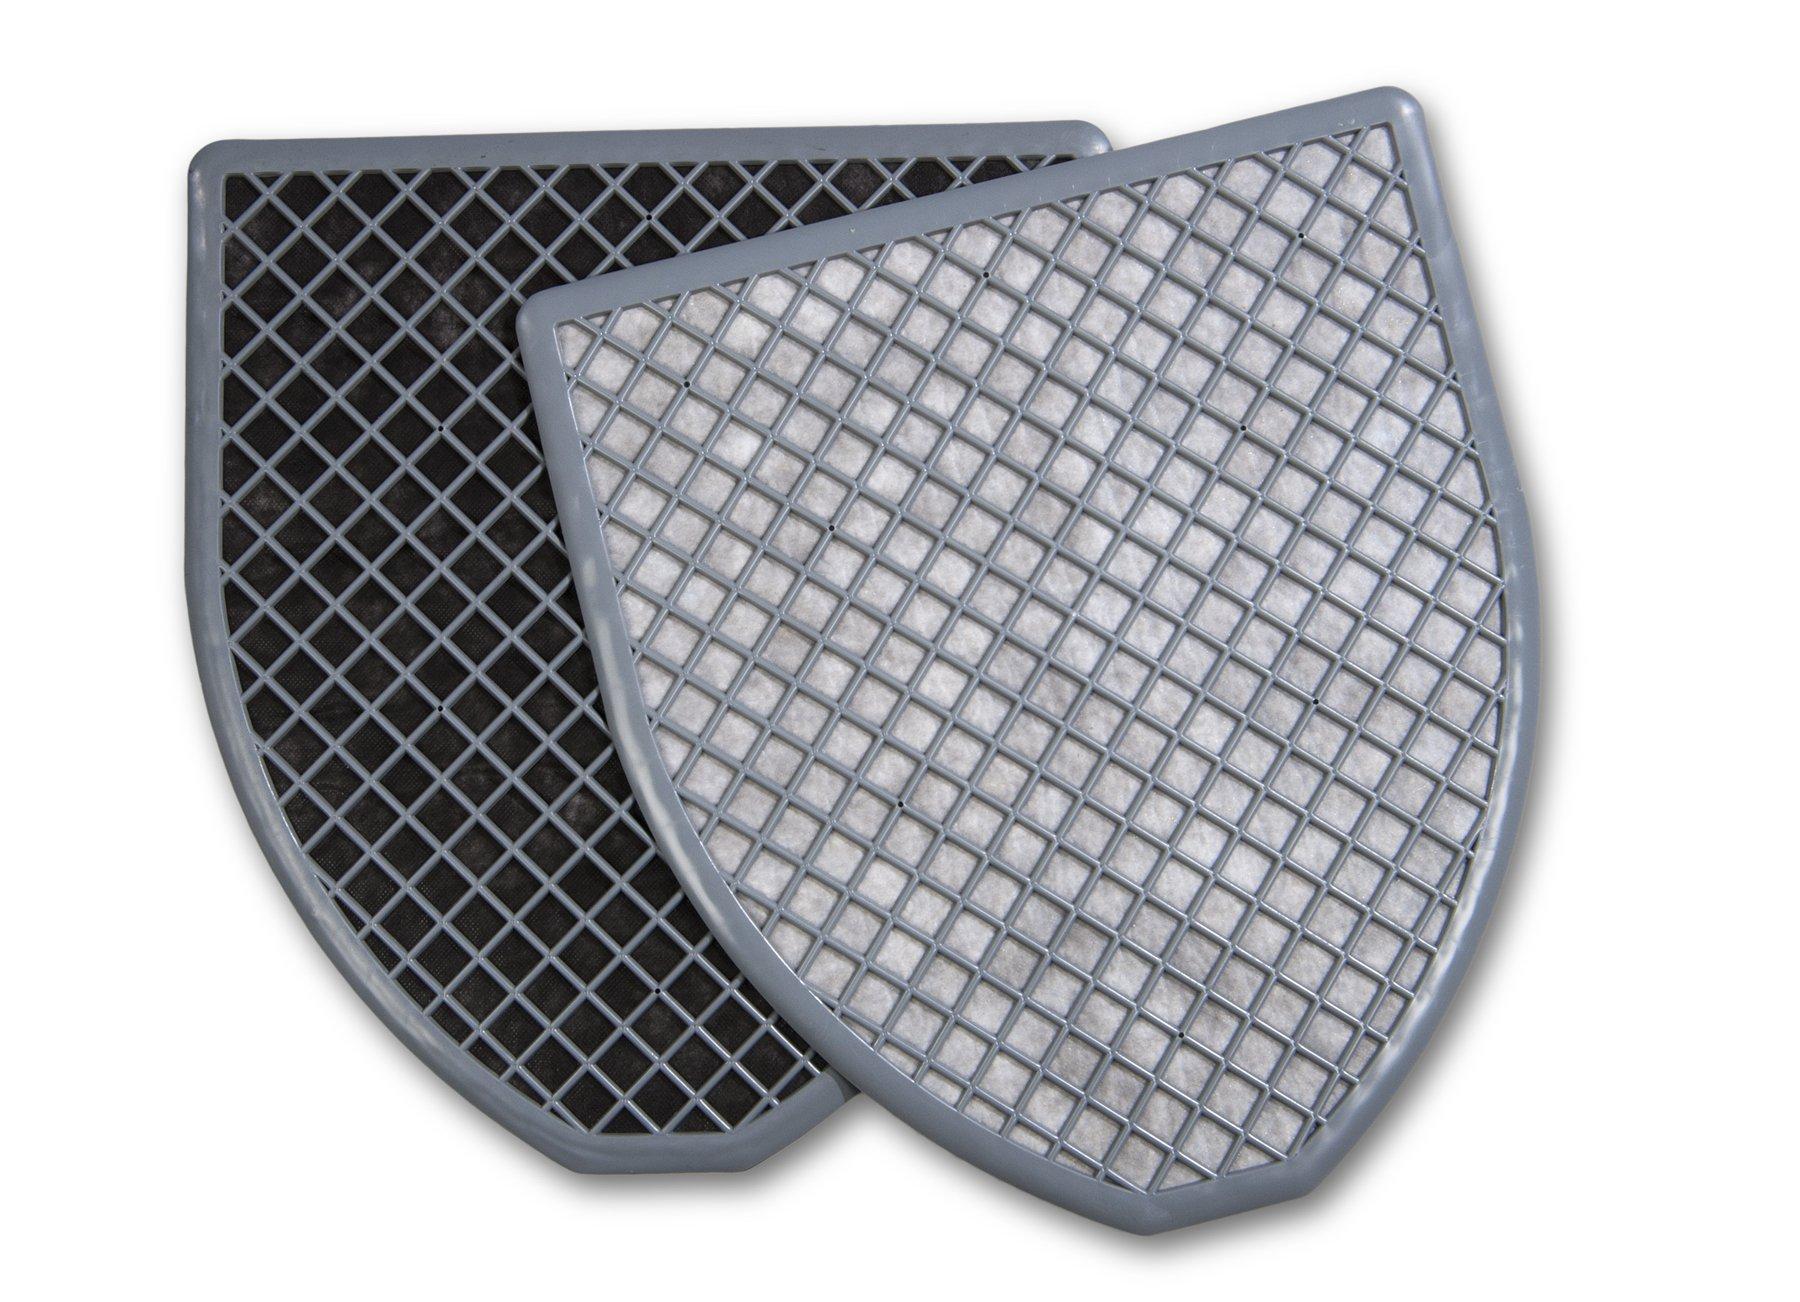 ESP DRIPG Drip-Wick Universal Disposable Absorbent Urinal Floor Mat, 20'' Length x 16'' Width, Gray (Pack of 6)